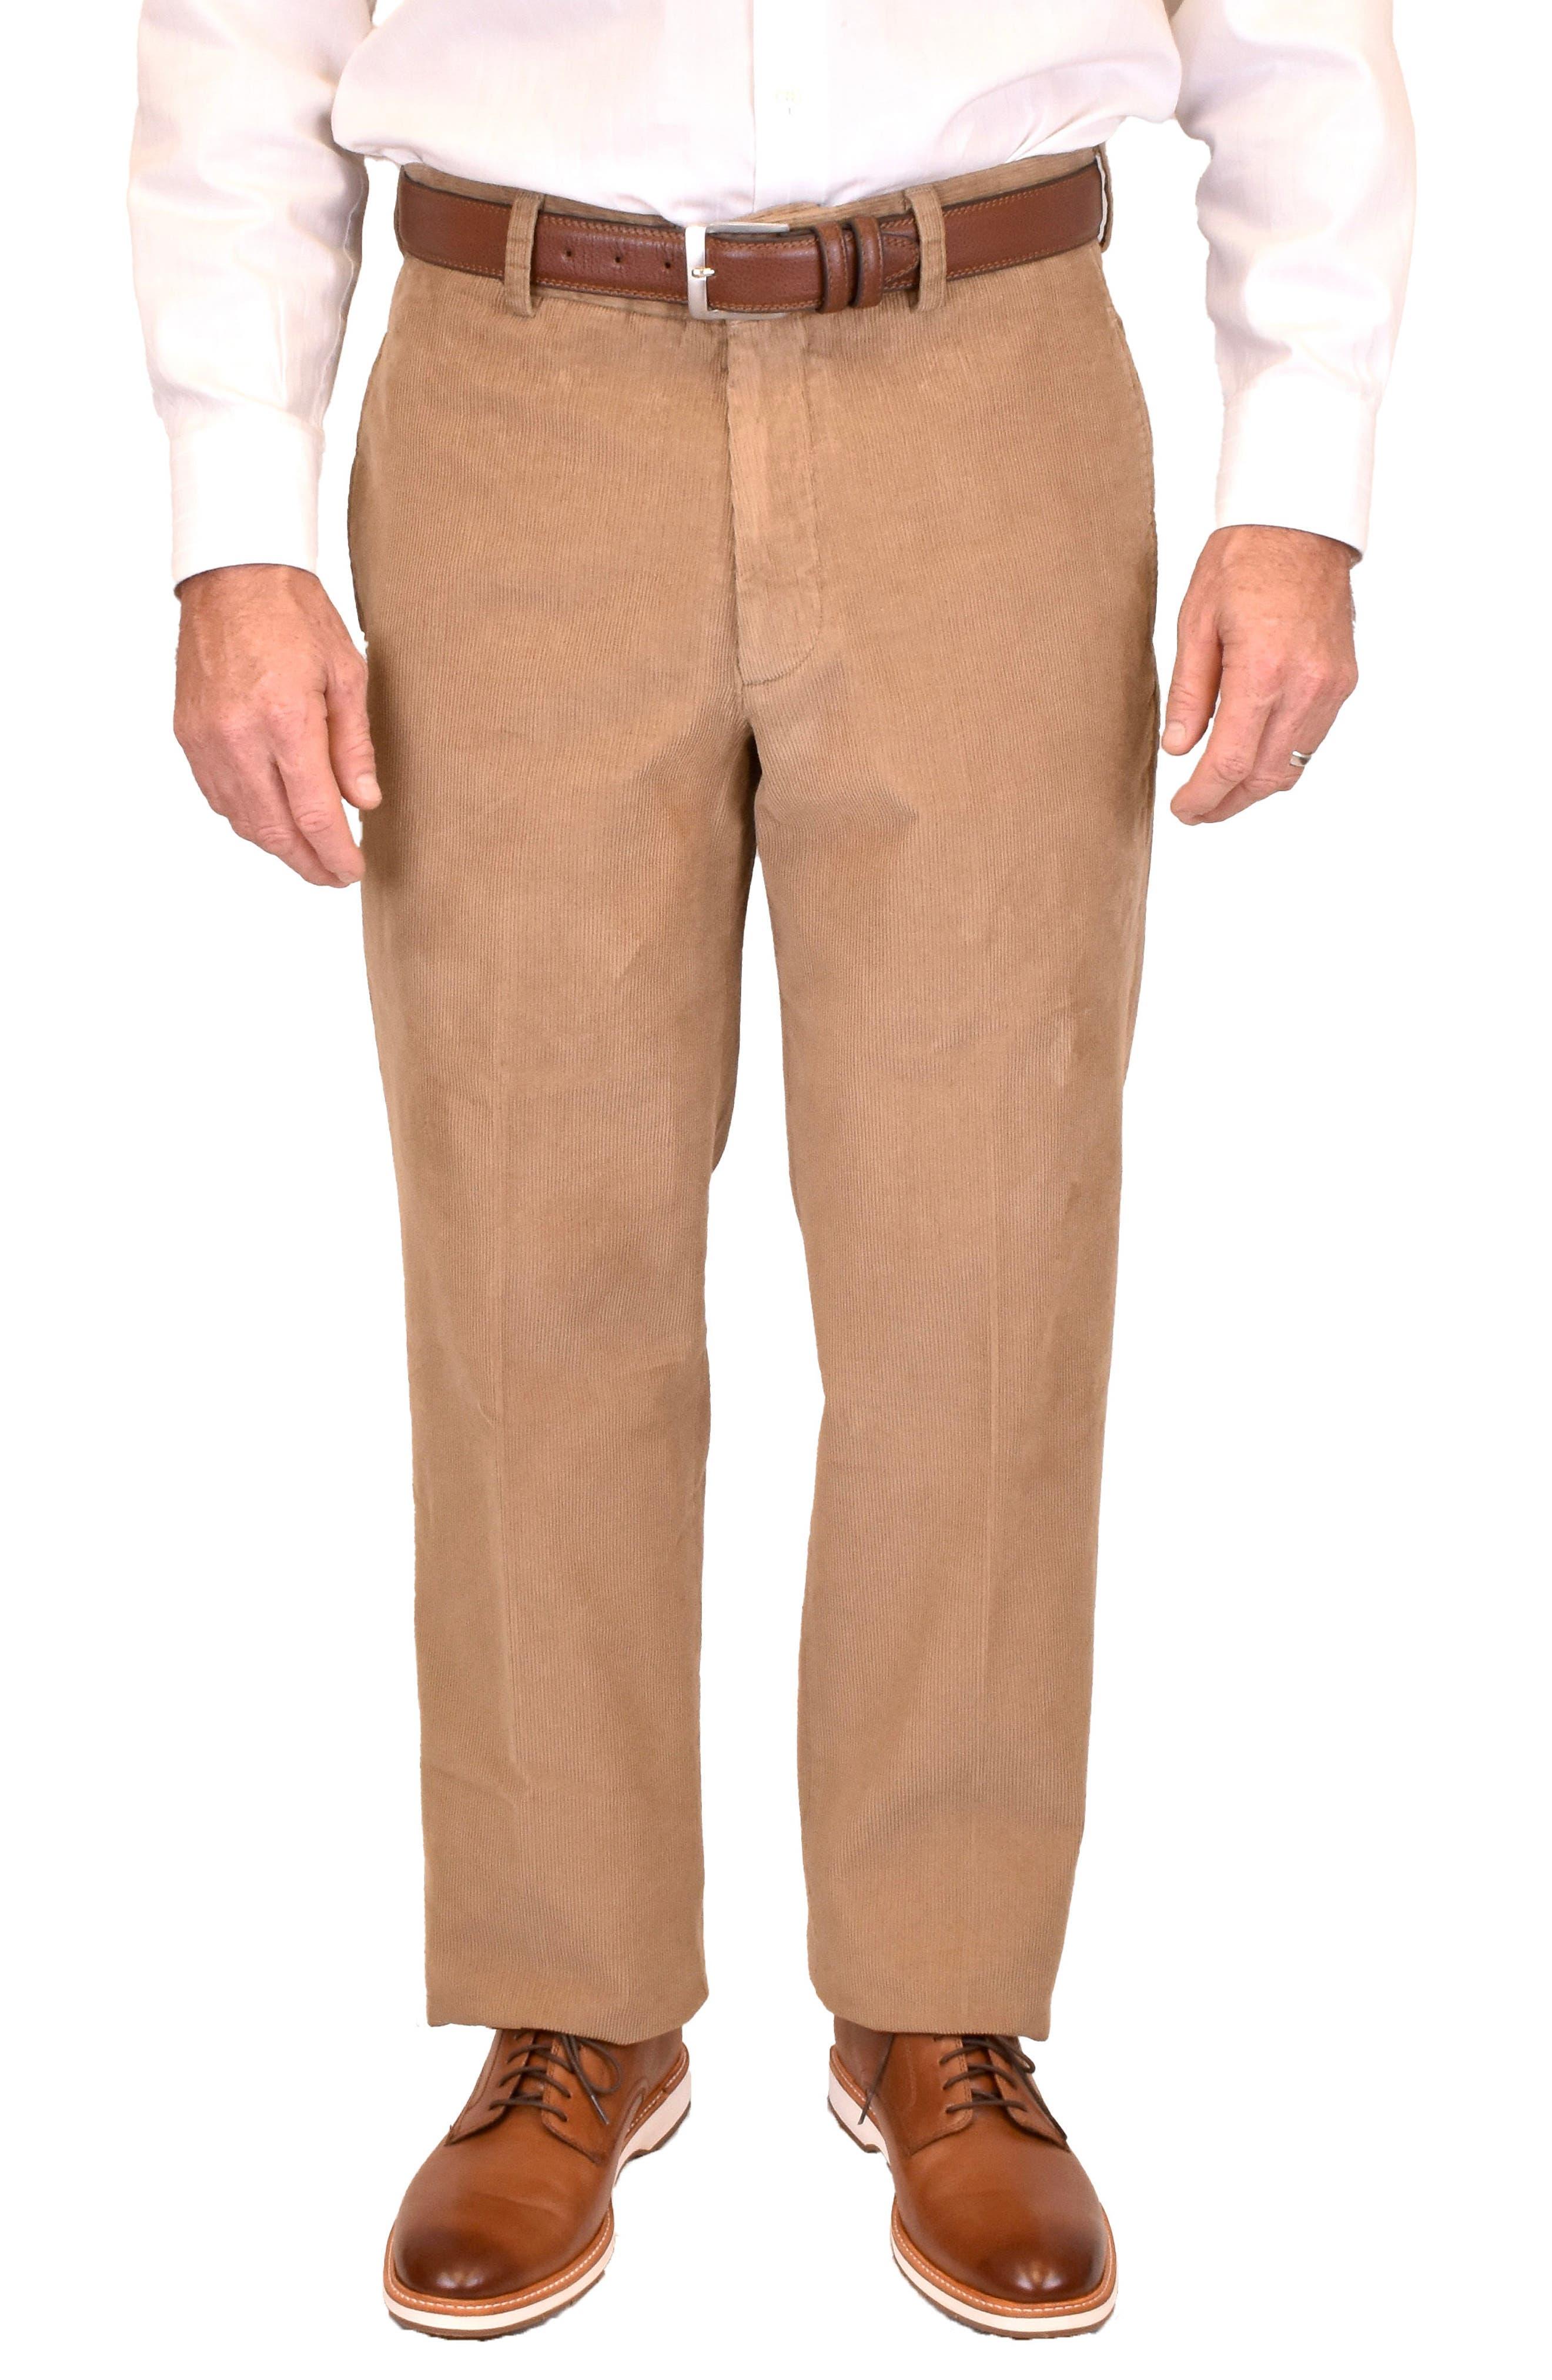 1950s Men's Pants, Trousers, Shorts | Rockabilly Jeans, Greaser Styles Mens Berle Charleston Flat Front Cotton Corduroy Dress Pants Size 42 - Beige $130.00 AT vintagedancer.com